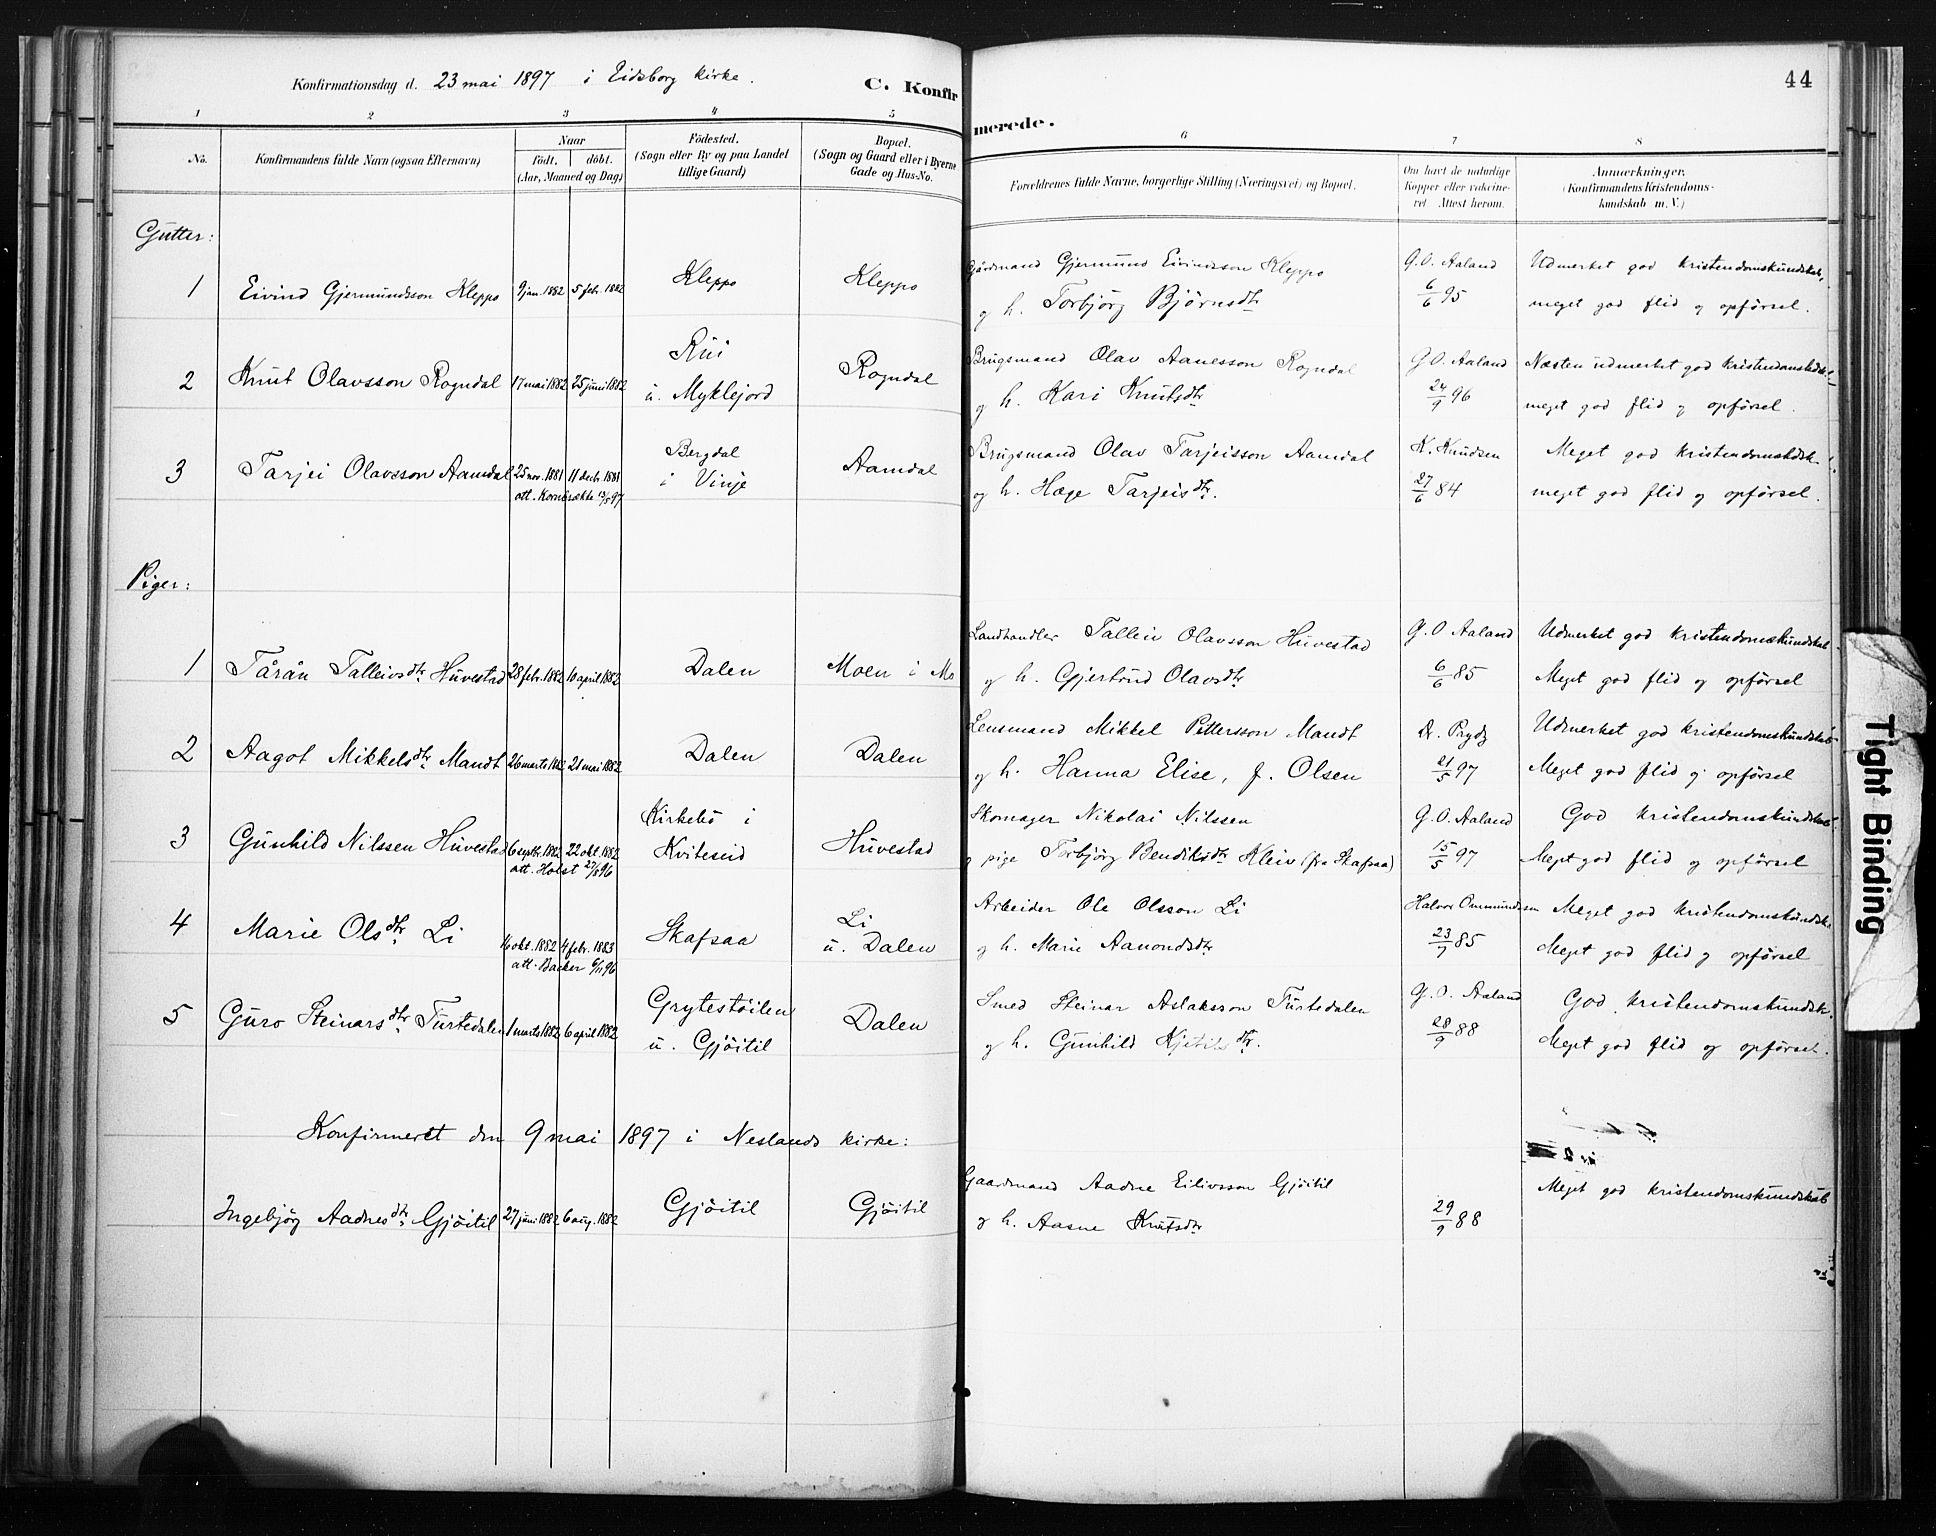 SAKO, Lårdal kirkebøker, F/Fb/L0002: Ministerialbok nr. II 2, 1887-1918, s. 44